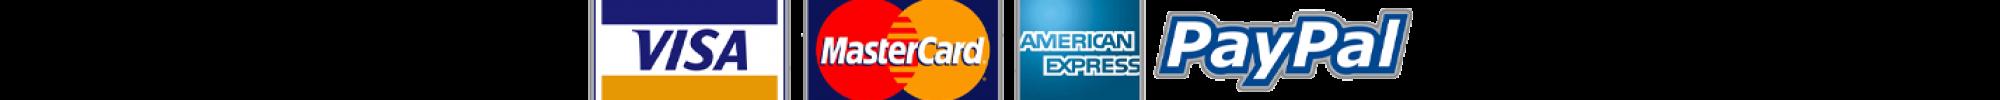 logo-credit-card-payment-card-american-express-credit-card-3ccc9605cfe5c4f09564806ff1995ebd